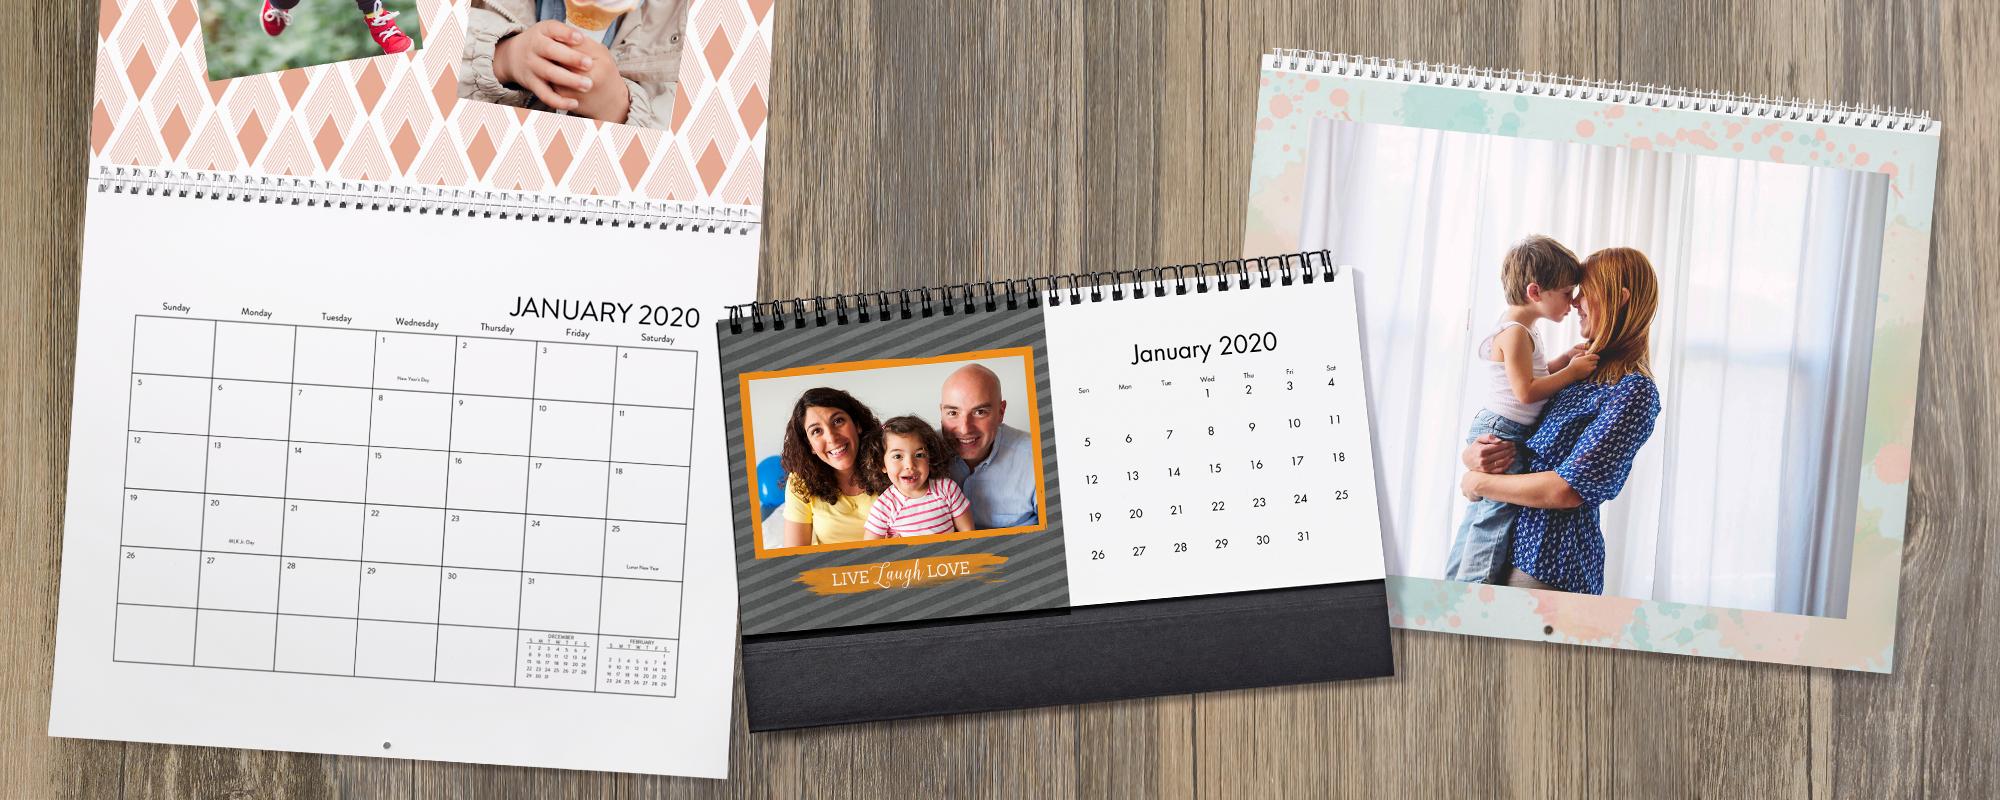 Personalized Calendars  2020 Photo Calendars At Cvs Photo pertaining to Kodak Calendar Maker